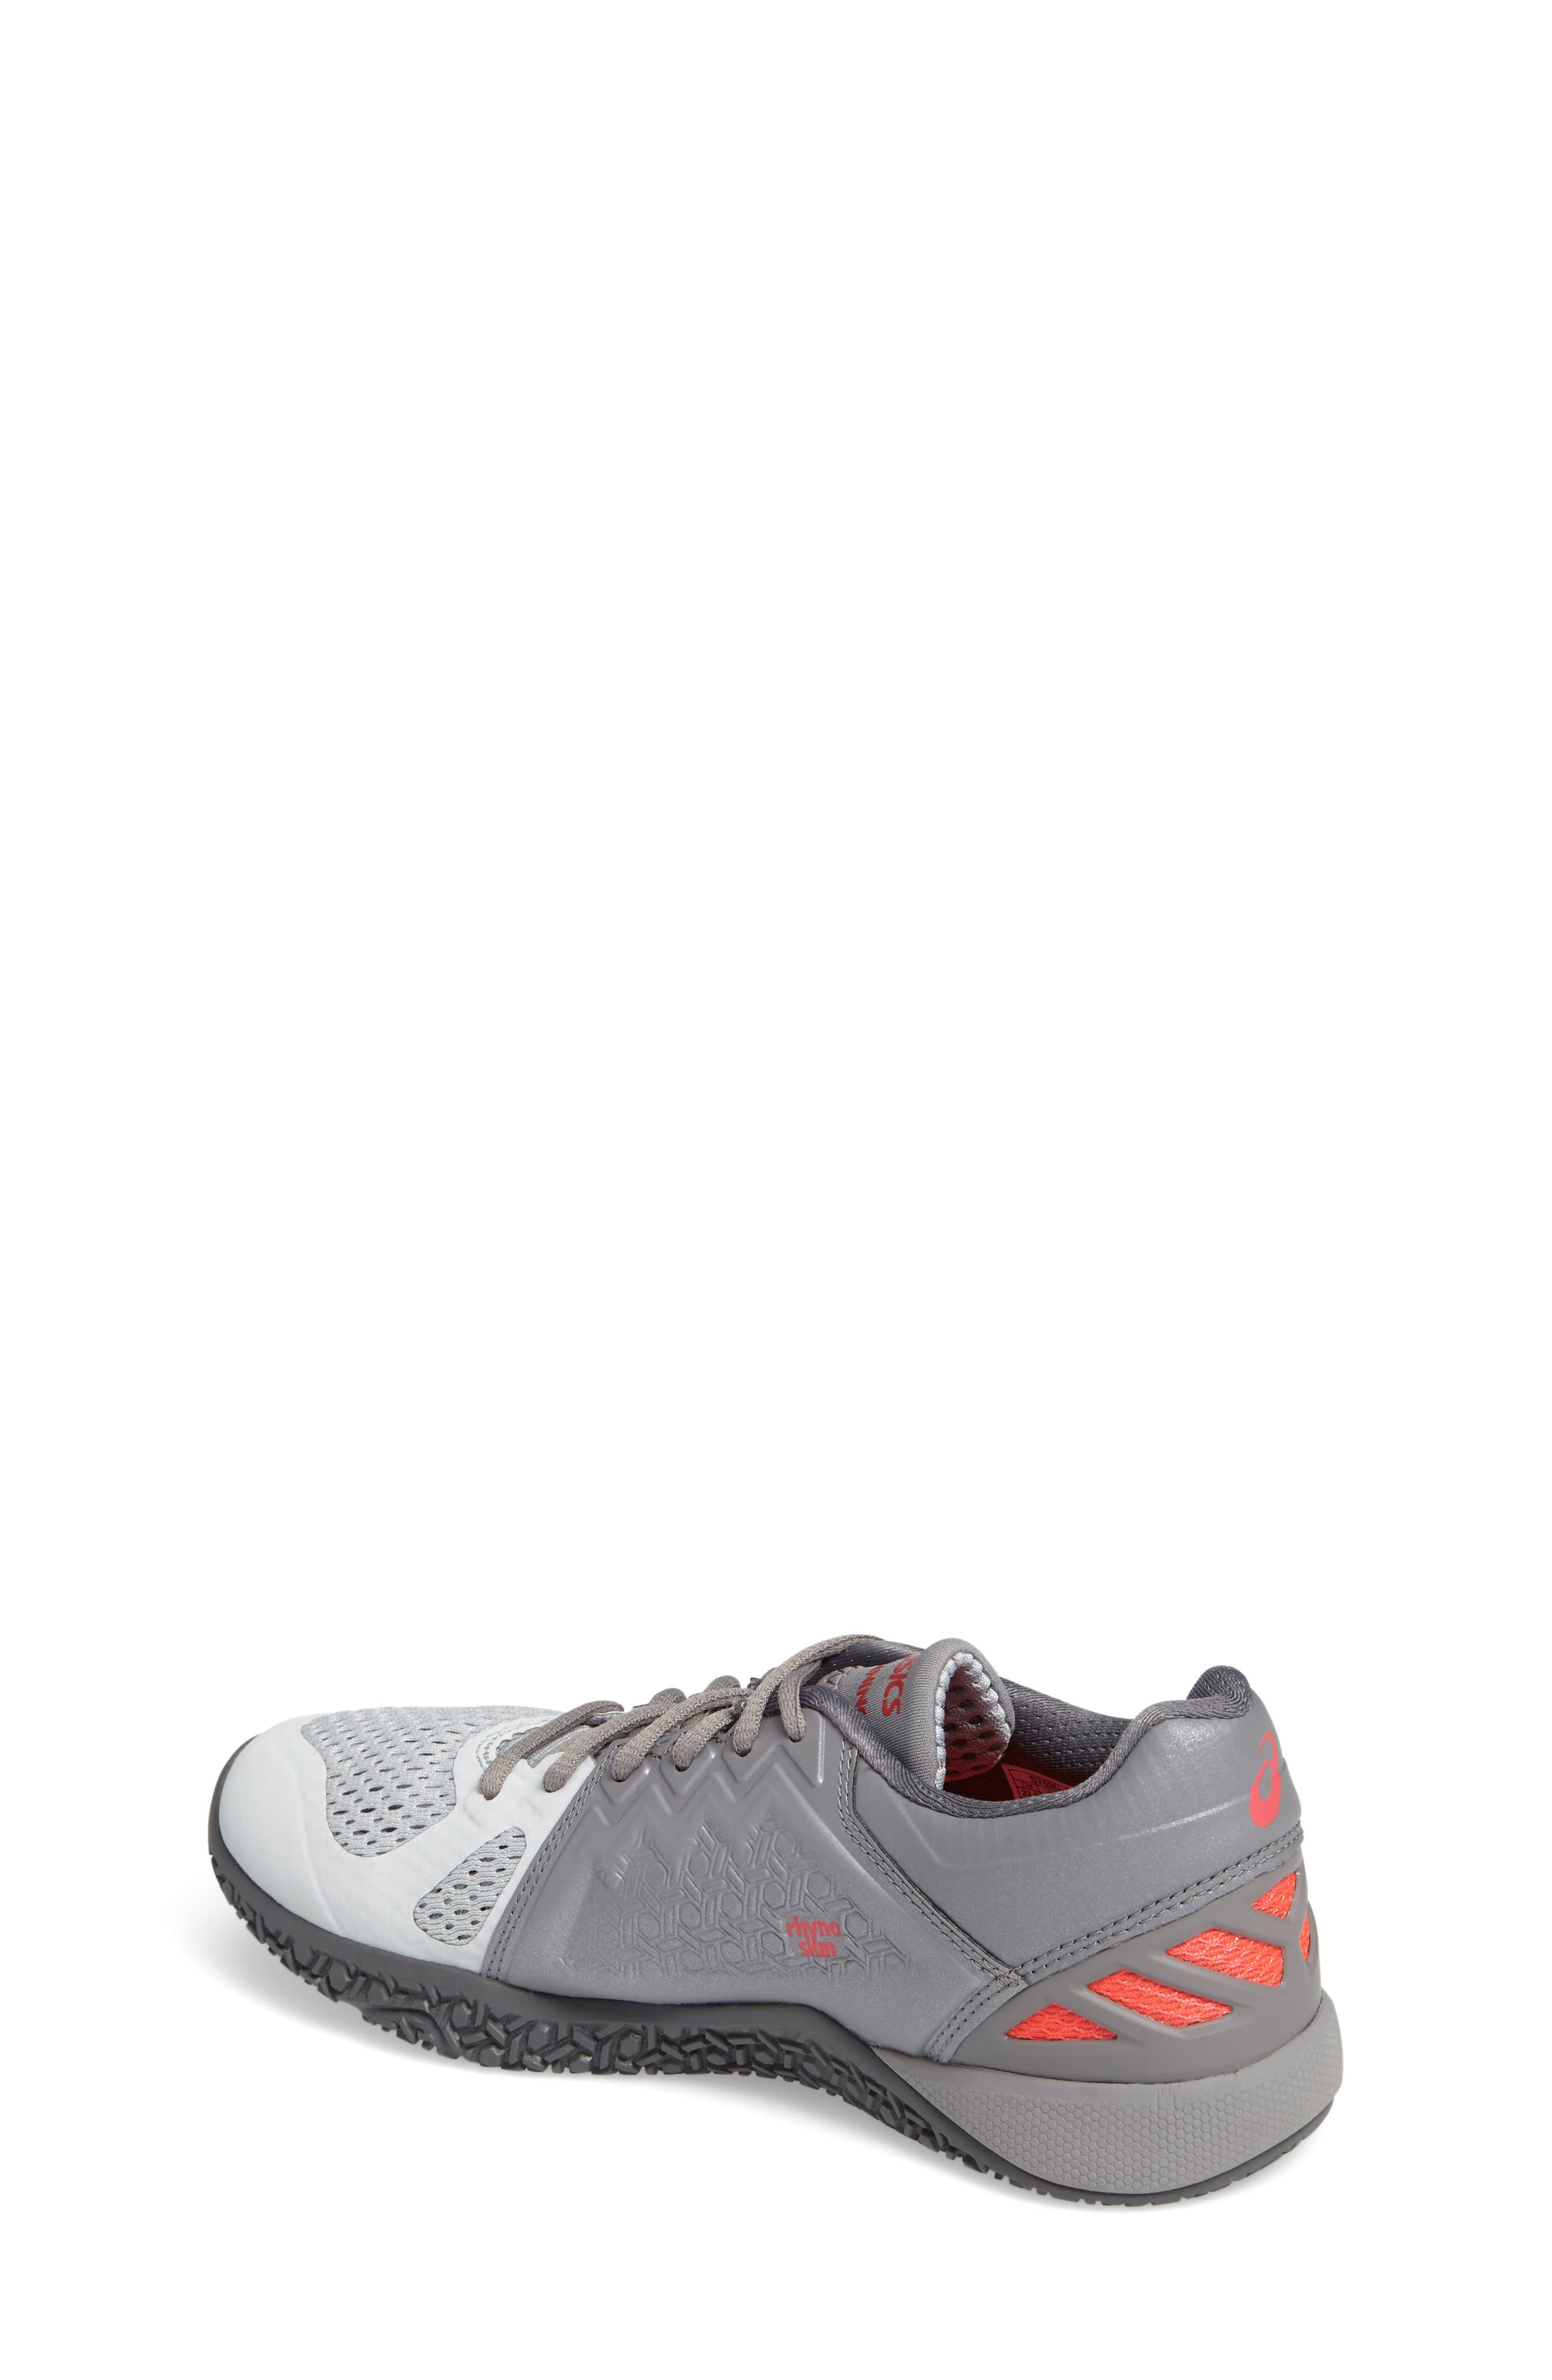 ASICS Conviction X Training Shoe,                             Alternate thumbnail 2, color,                             096